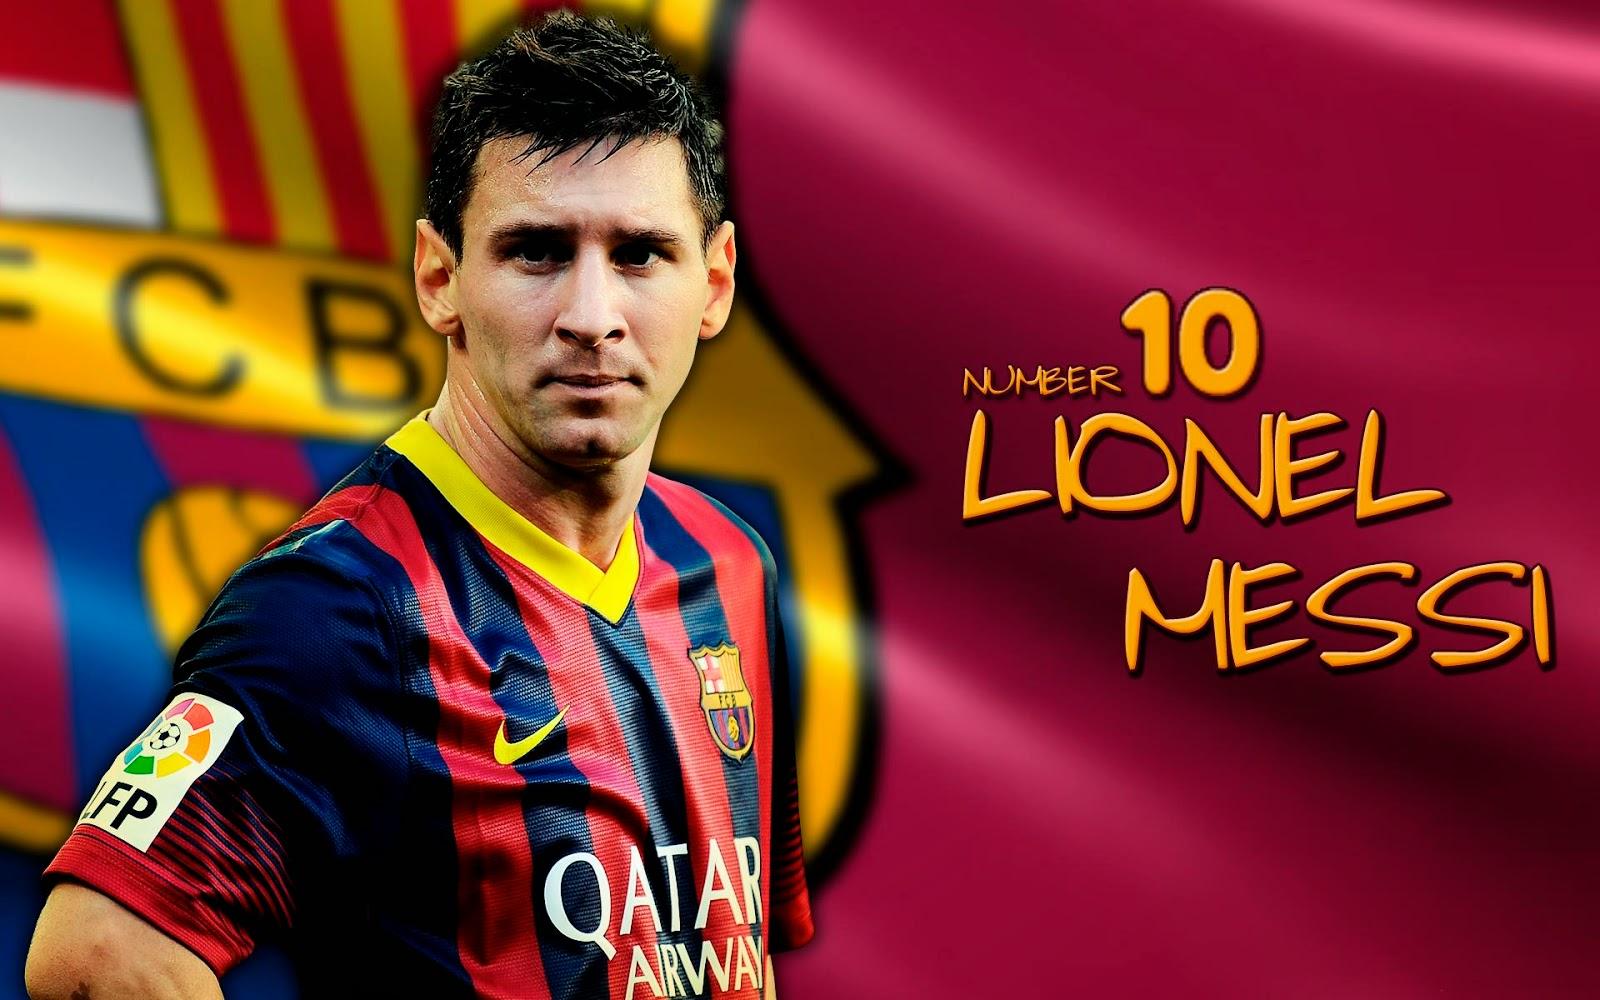 Kumpulan Wallpaper Trio MSN Fc Barcelona Lionel Messi Kata Kata